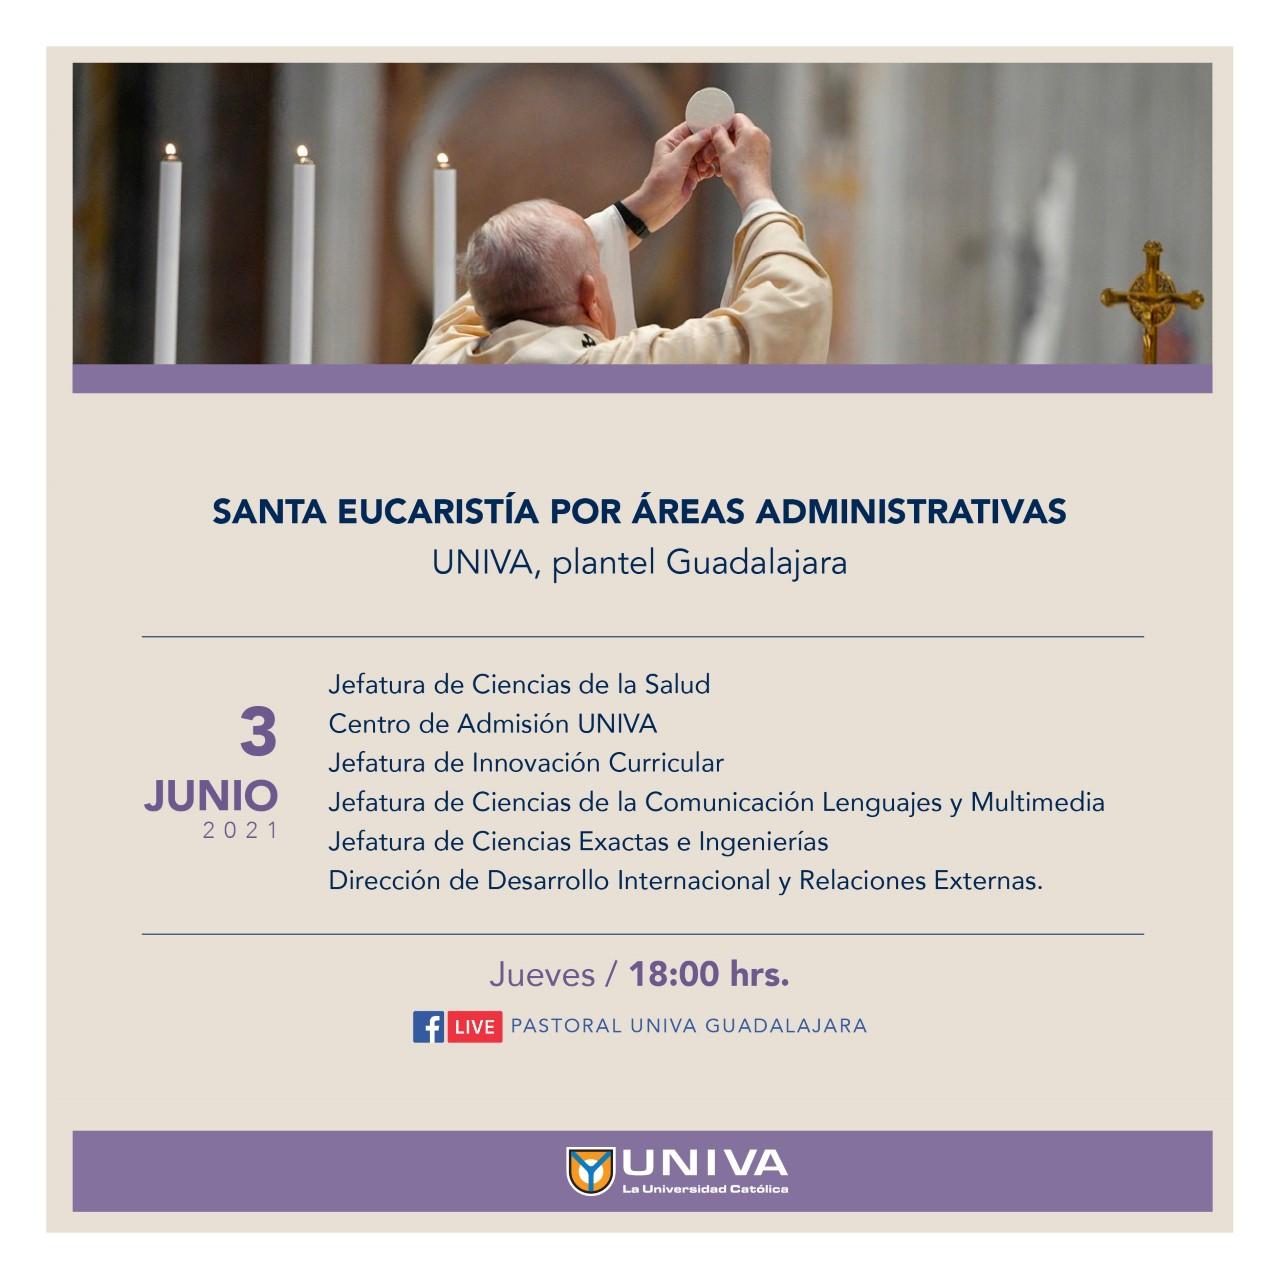 Santa Eucaristía por áreas administrativas